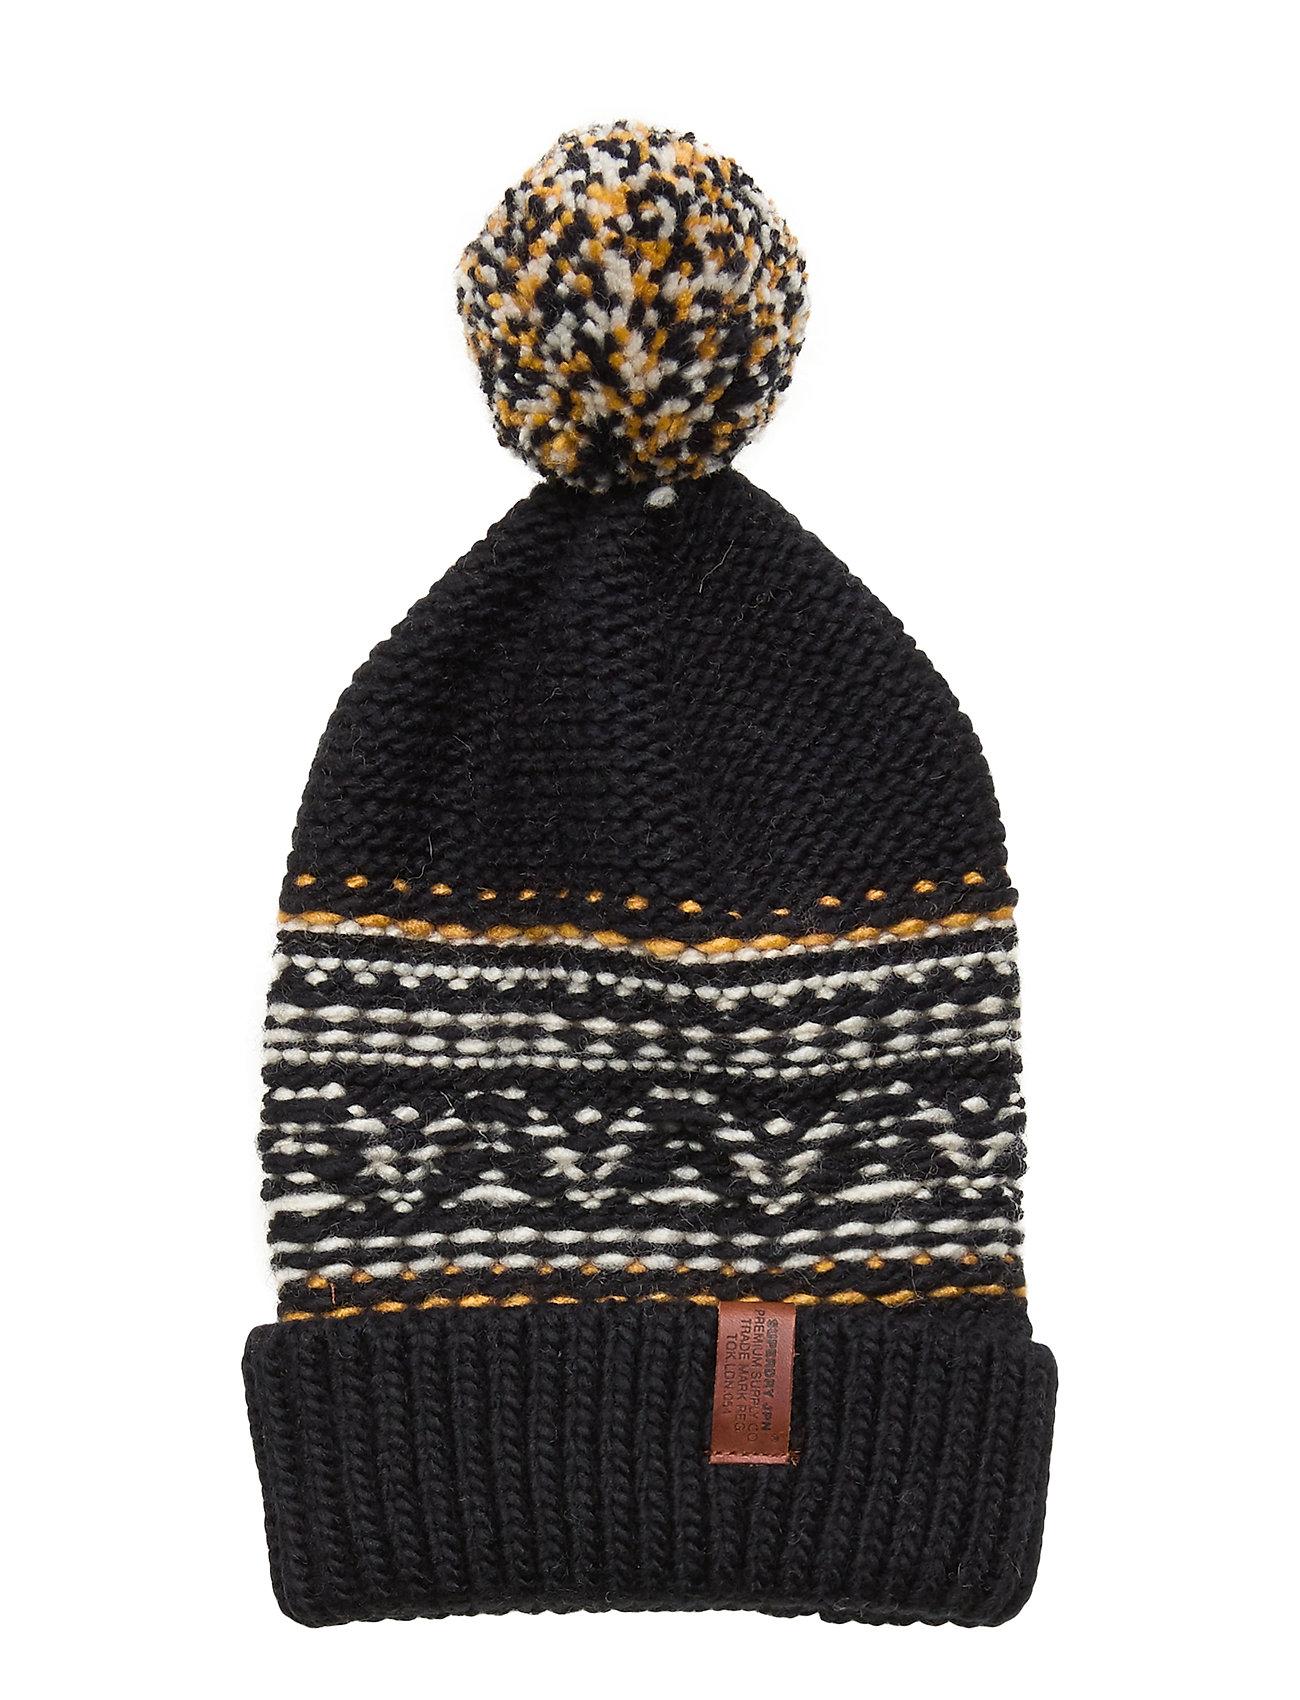 Image of Rhumi Bobble Hat Accessories Headwear Beanies Blå Superdry (3292991285)